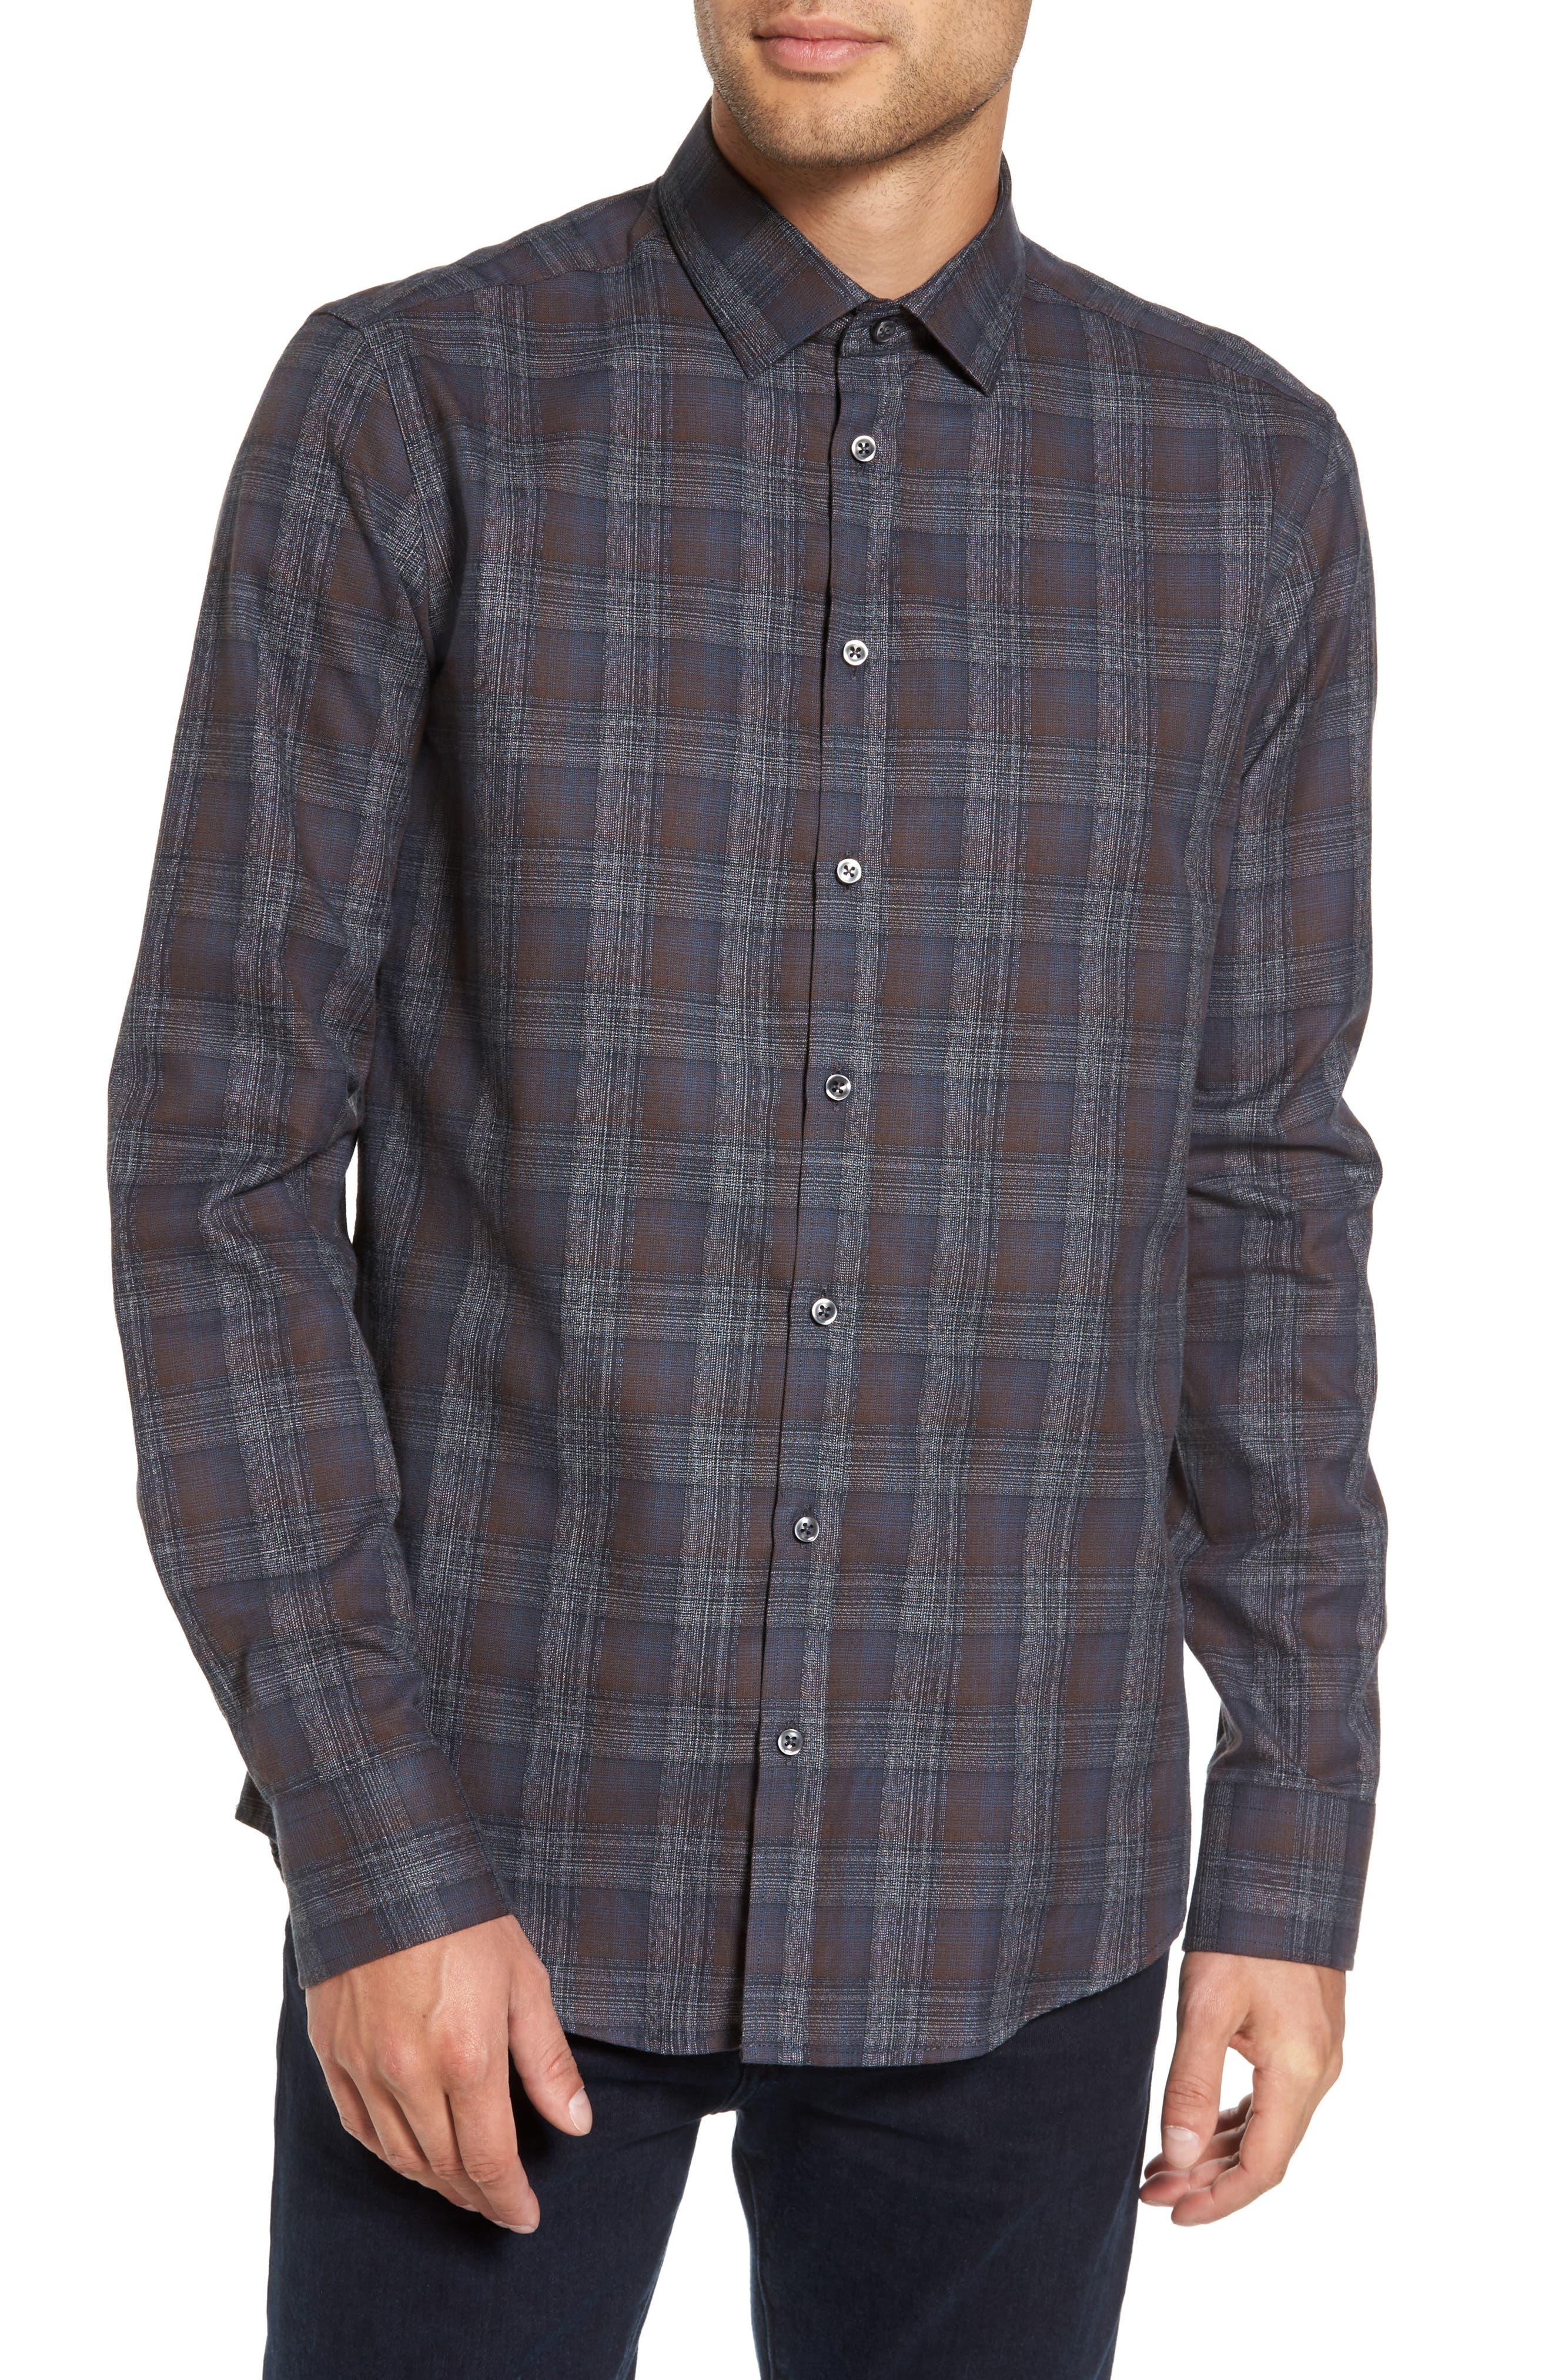 Trim Fit Plaid Sport Shirt,                             Main thumbnail 1, color,                             290 Brown Grey Plaid